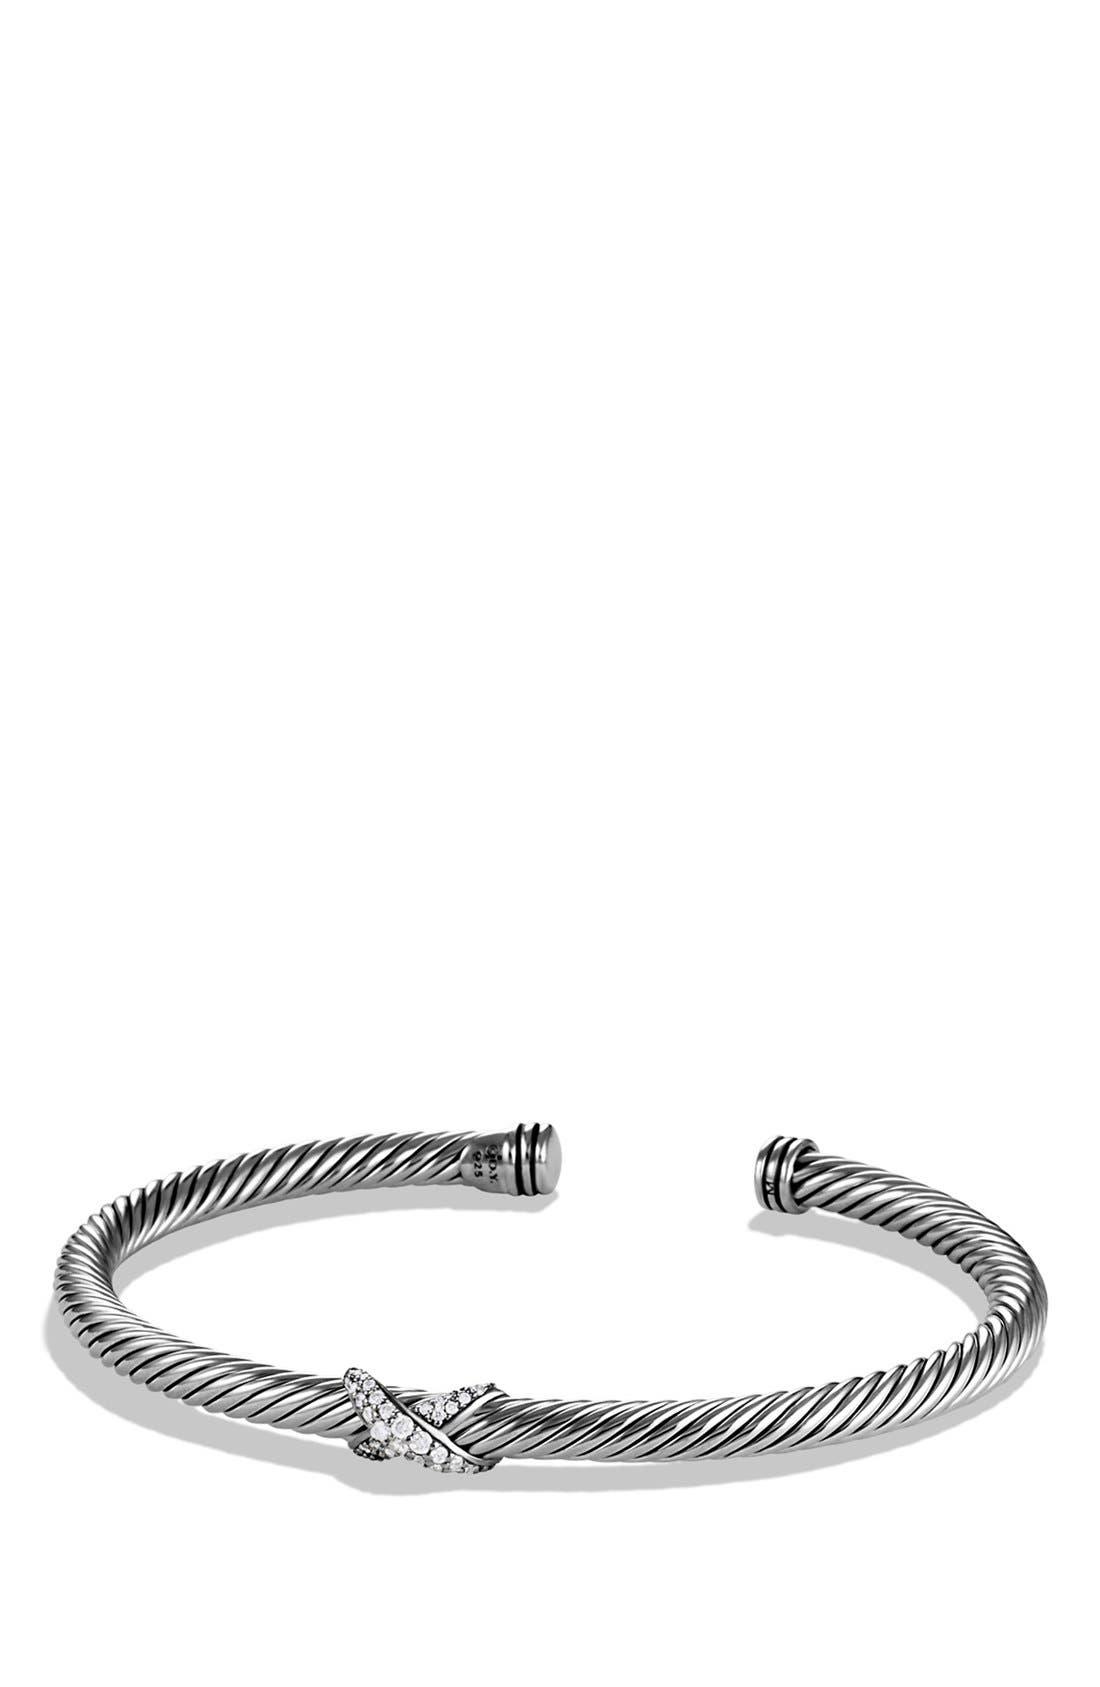 'X' Bracelet with Diamonds,                         Main,                         color, Diamond